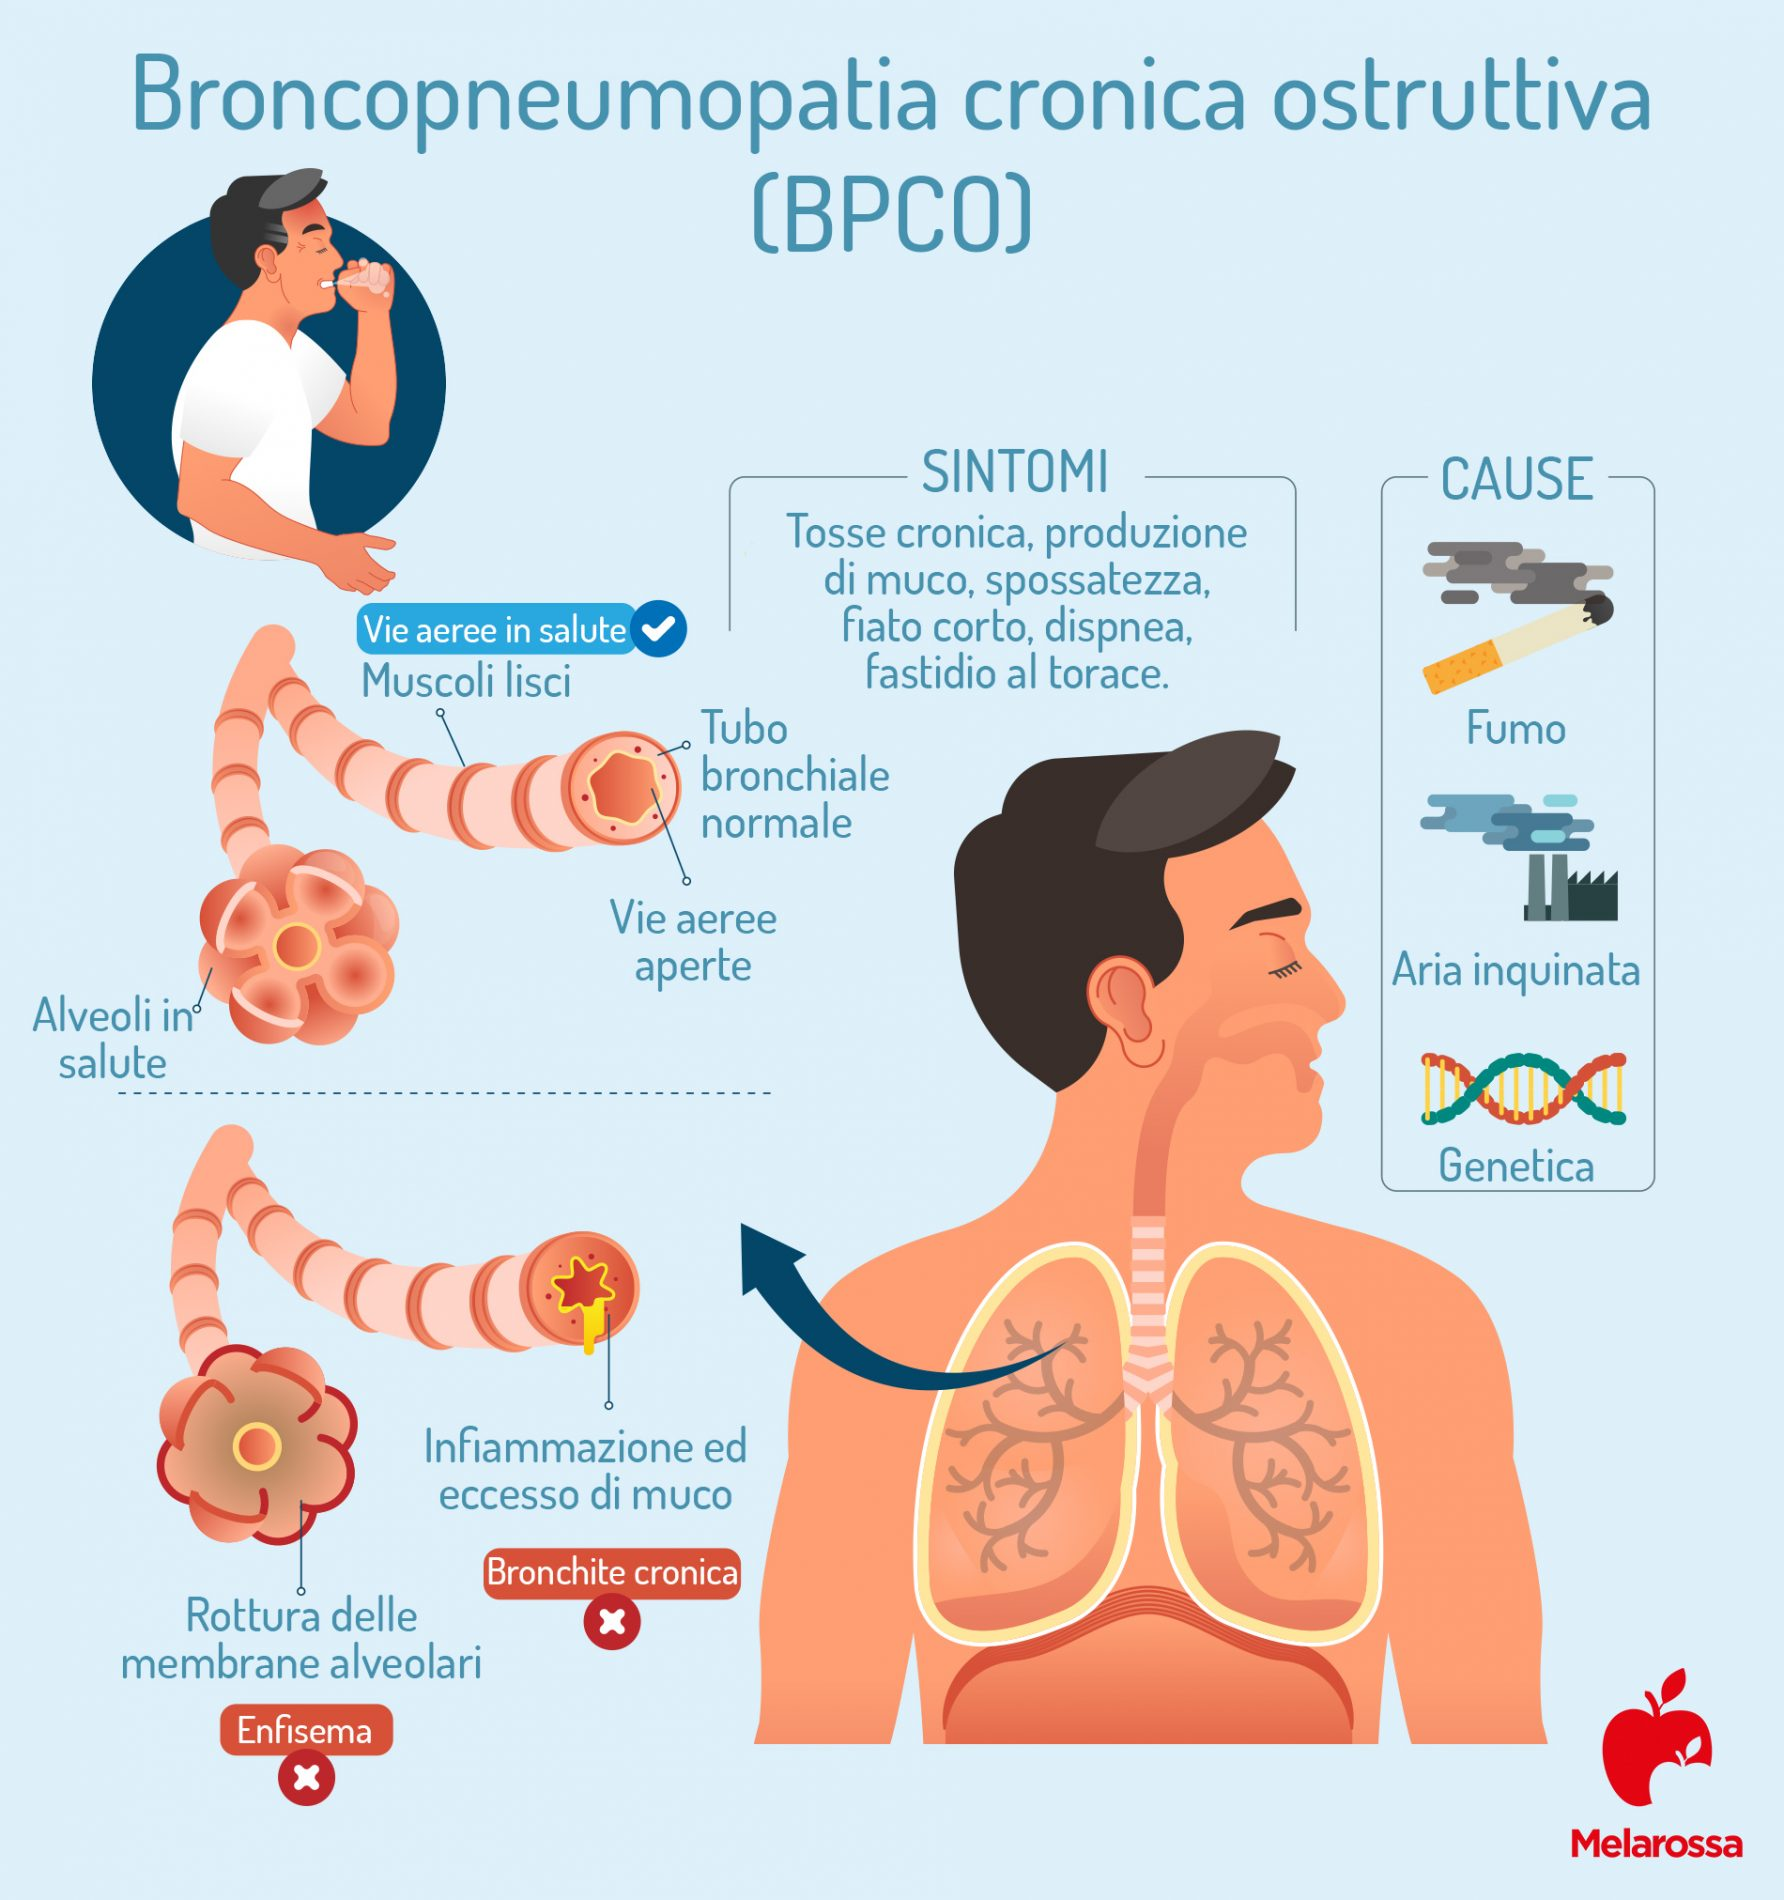 malattie respiratorie: Broncopneumopatia cronica ostruttiva